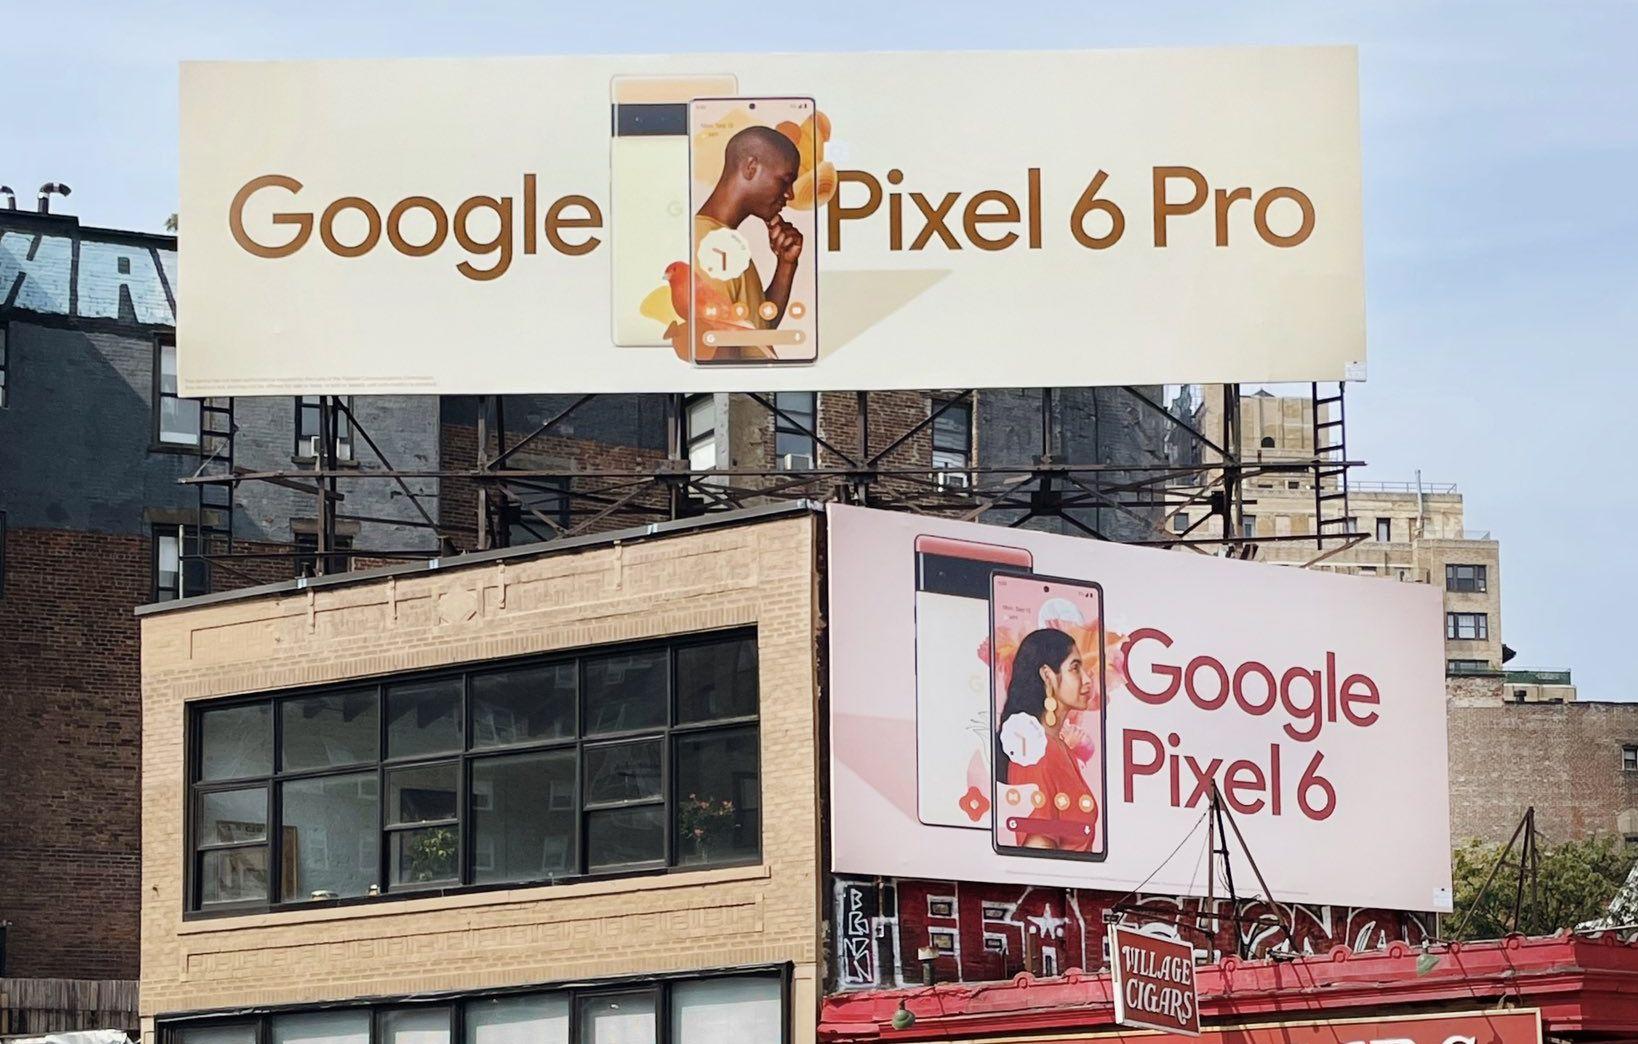 pixel 6 pro billboards